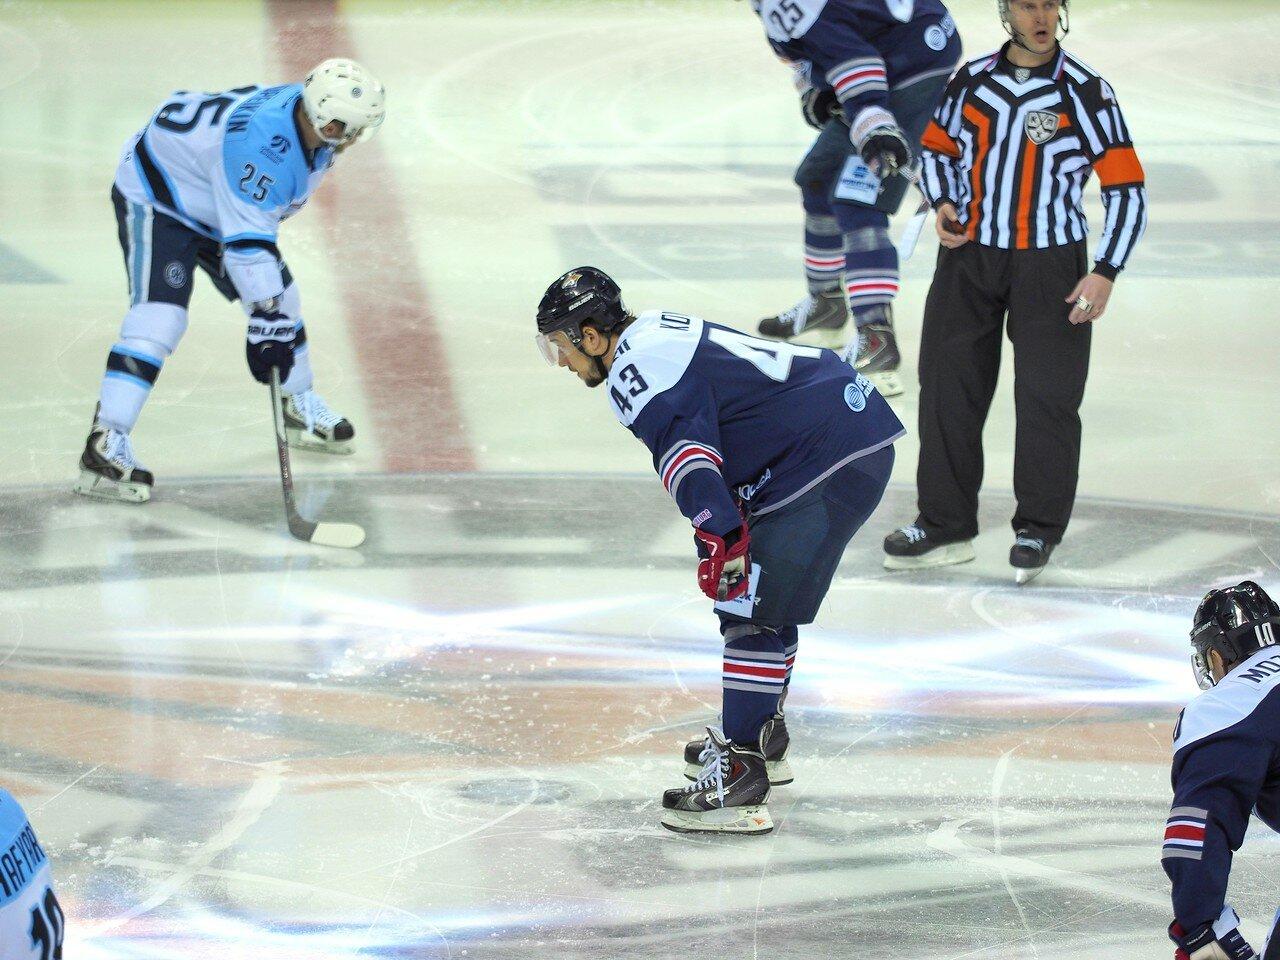 52Плей-офф 2016 Восток 1/2 Металлург - Сибирь 10.03.2016